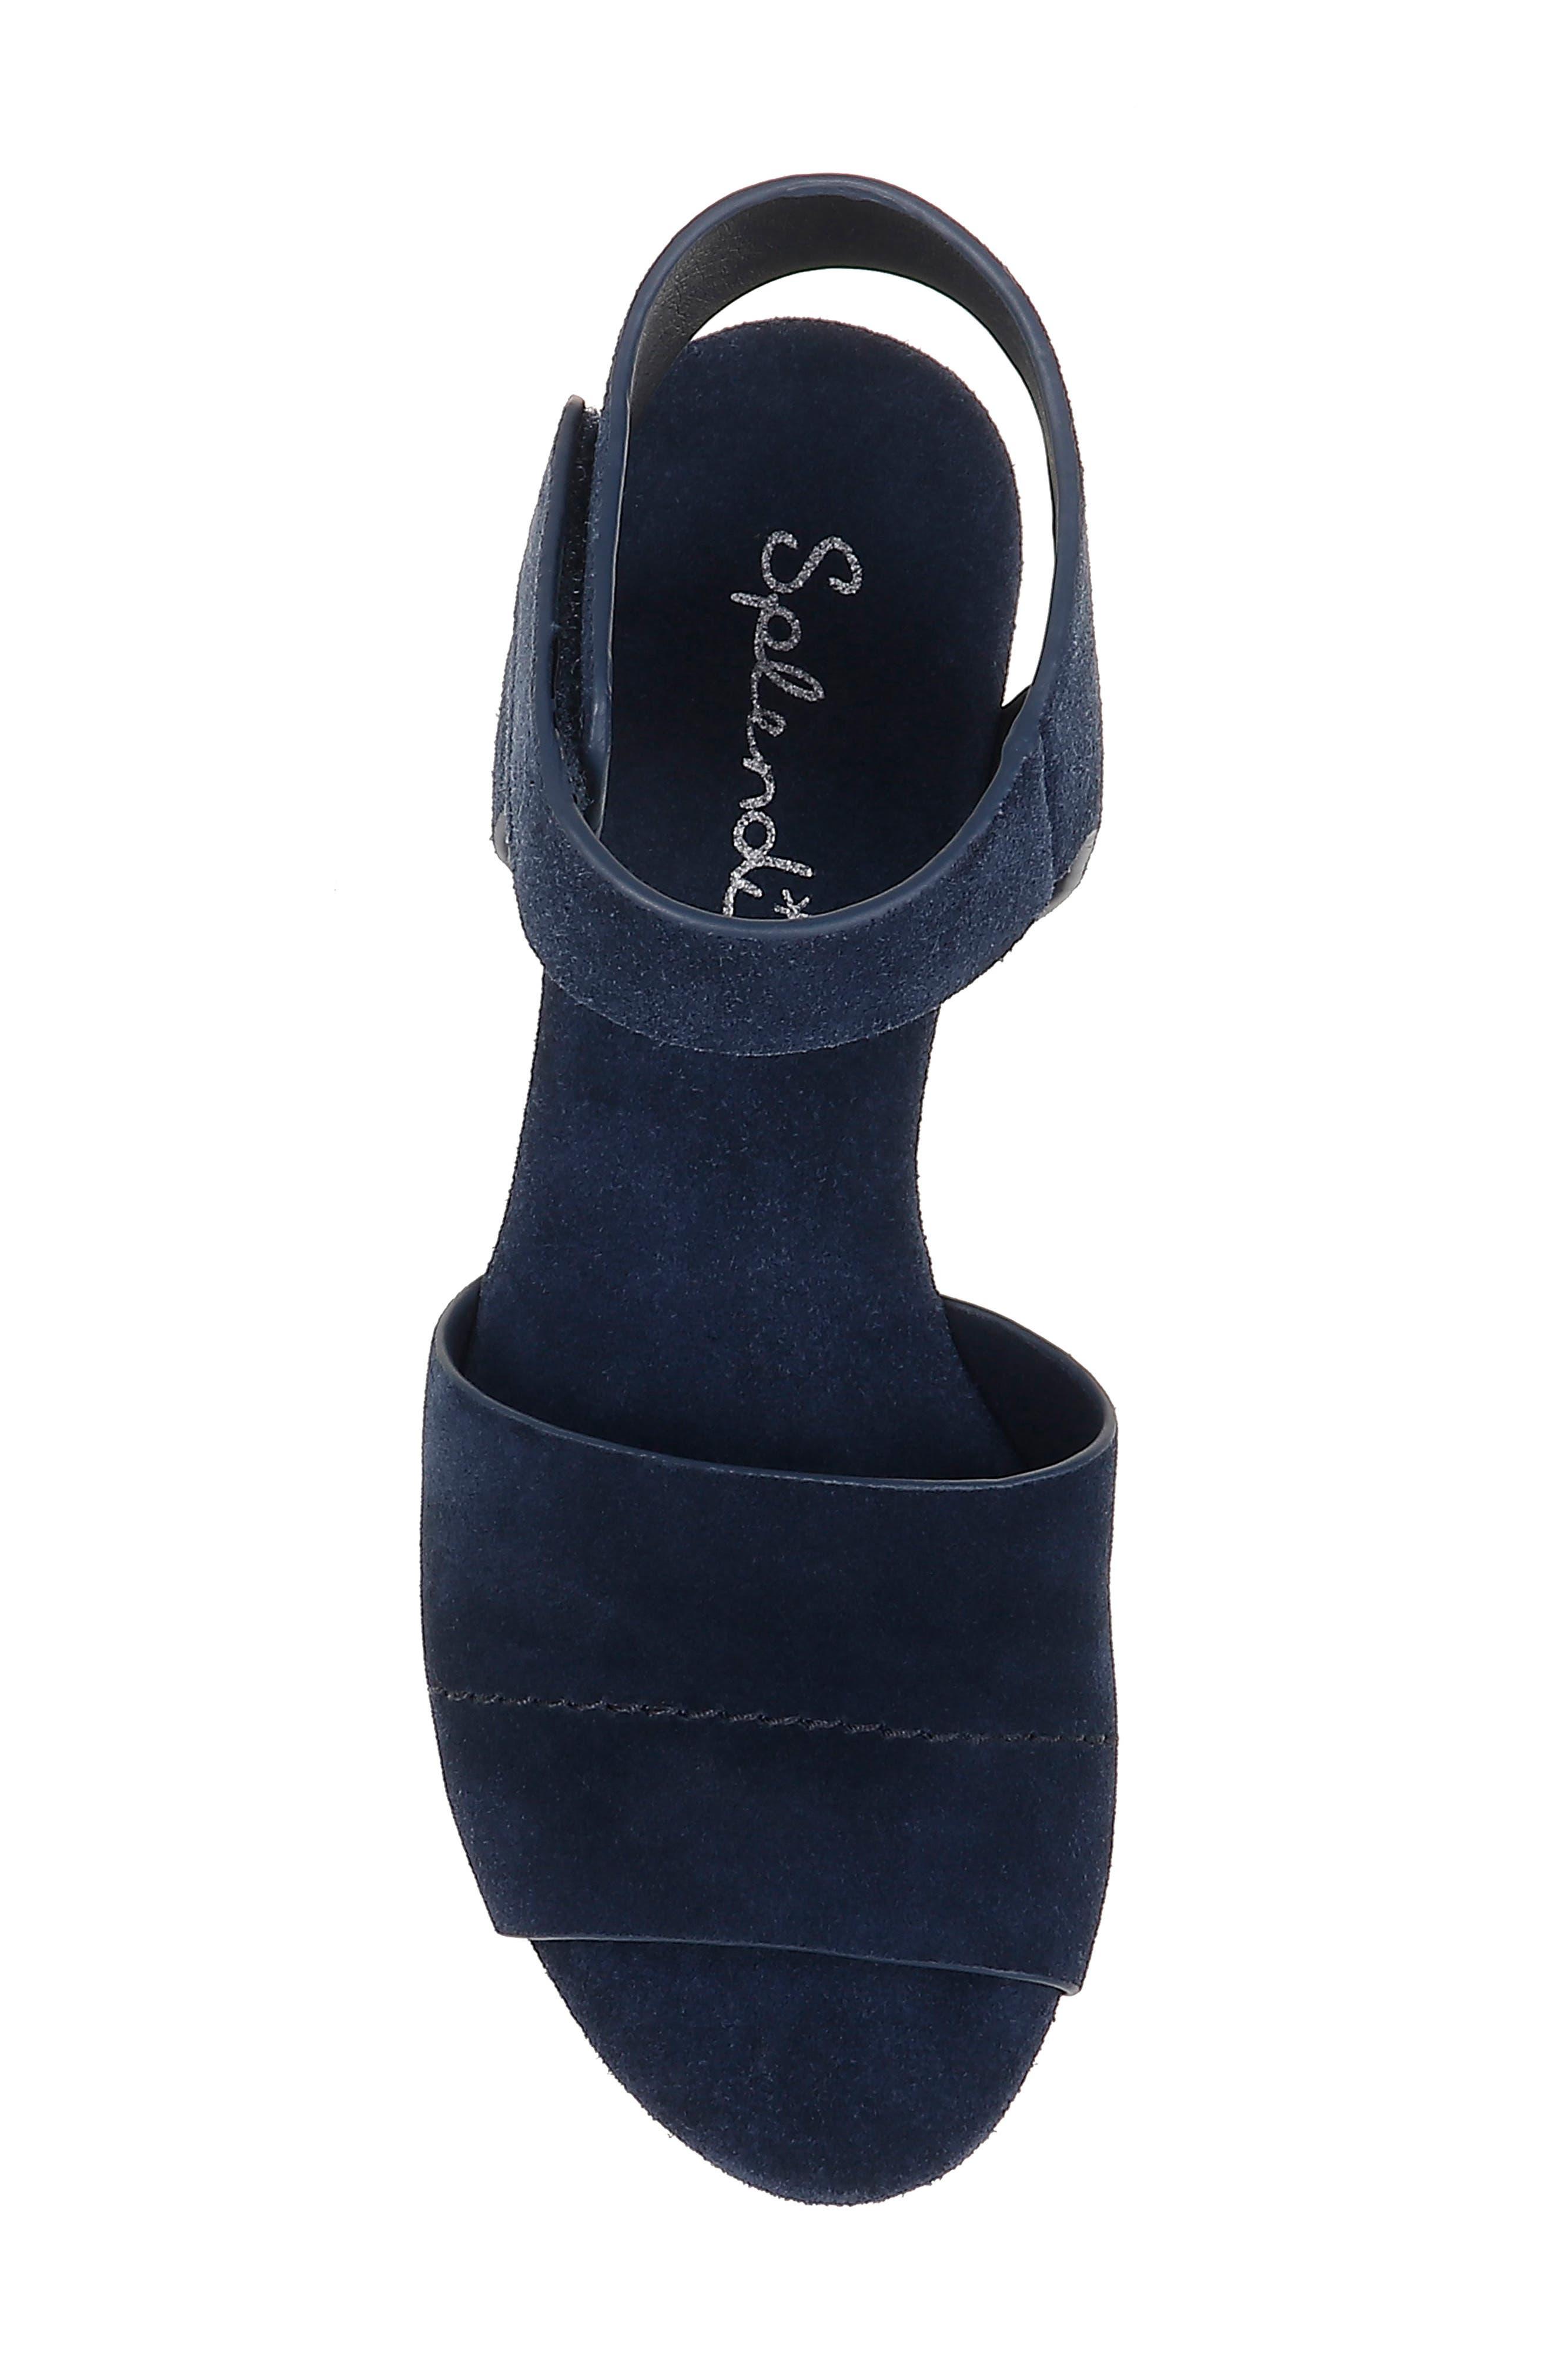 SPLENDID, Thatcher Platform Ankle Strap Sandal, Alternate thumbnail 5, color, NAVY SUEDE